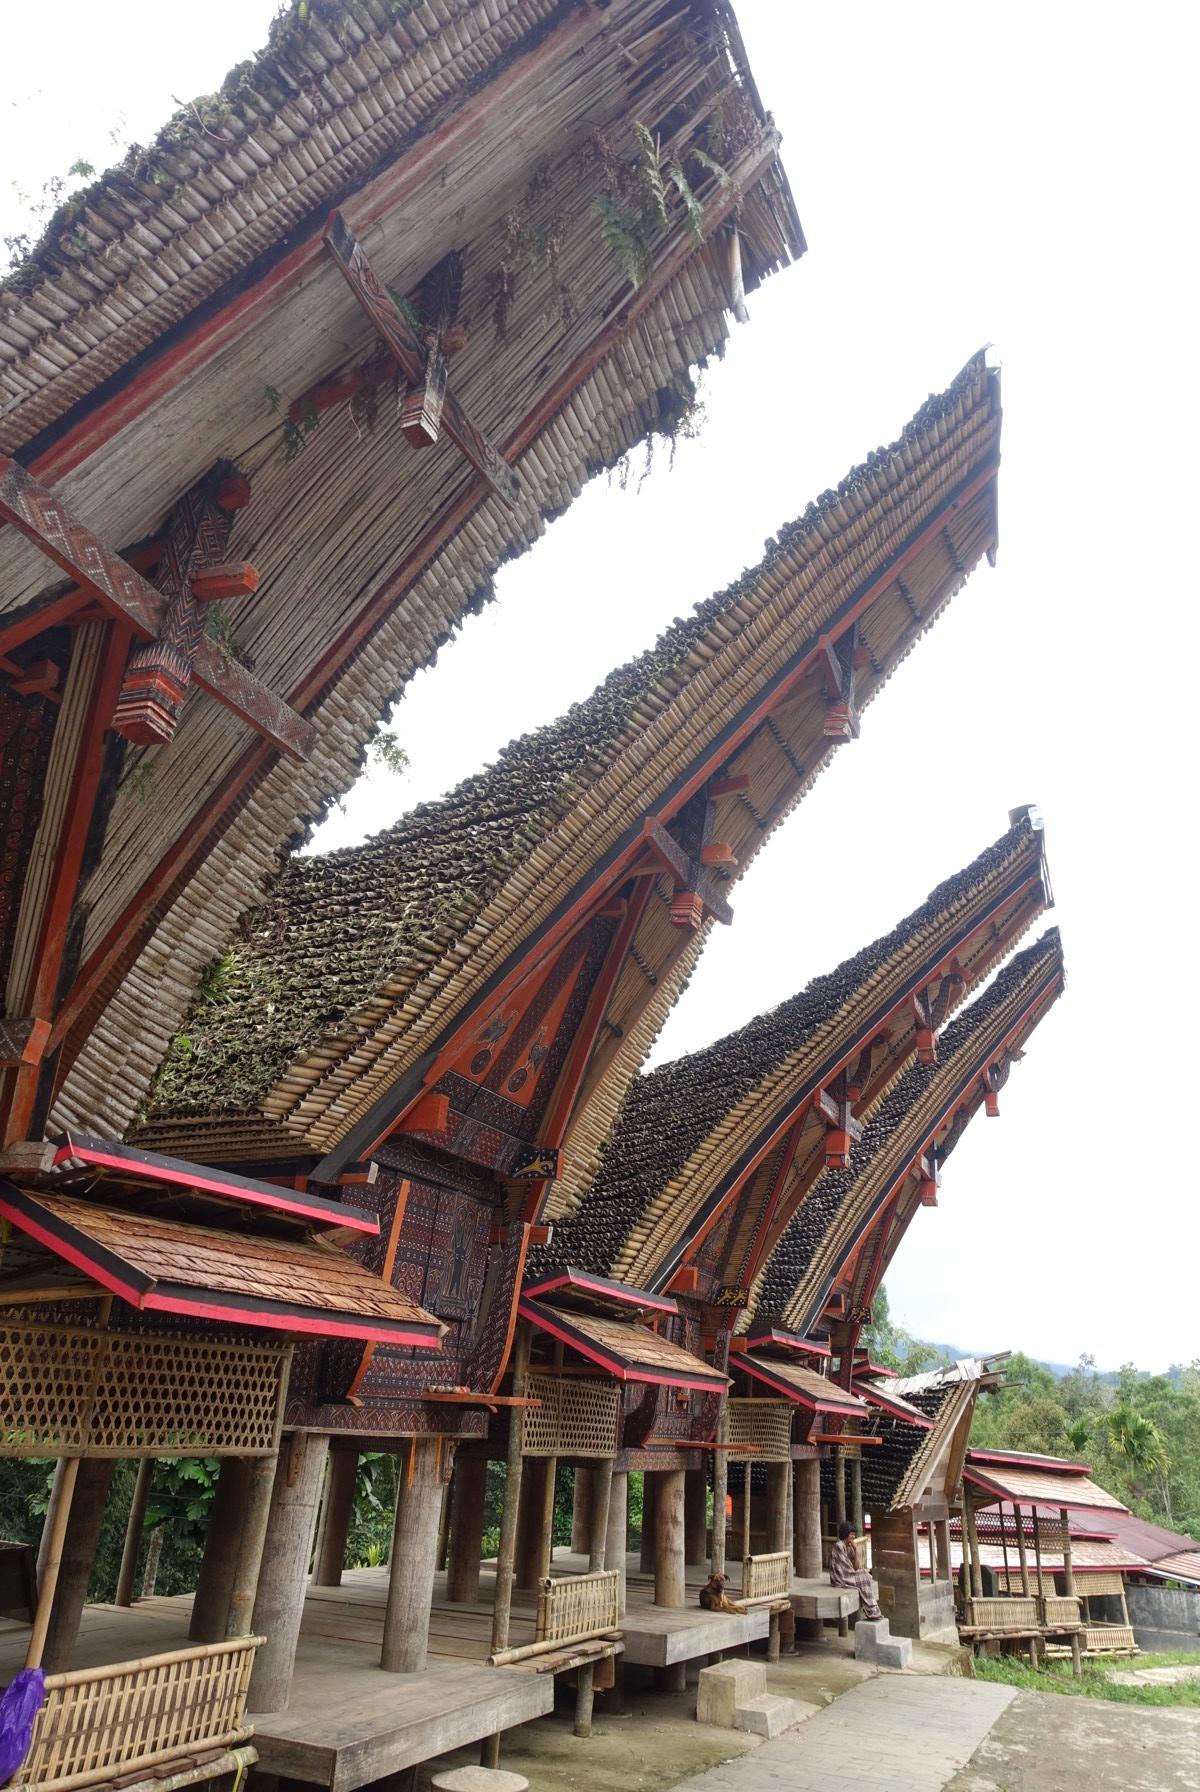 Indonesie_Sulawesi_Toraja_Rantepao DSC04797